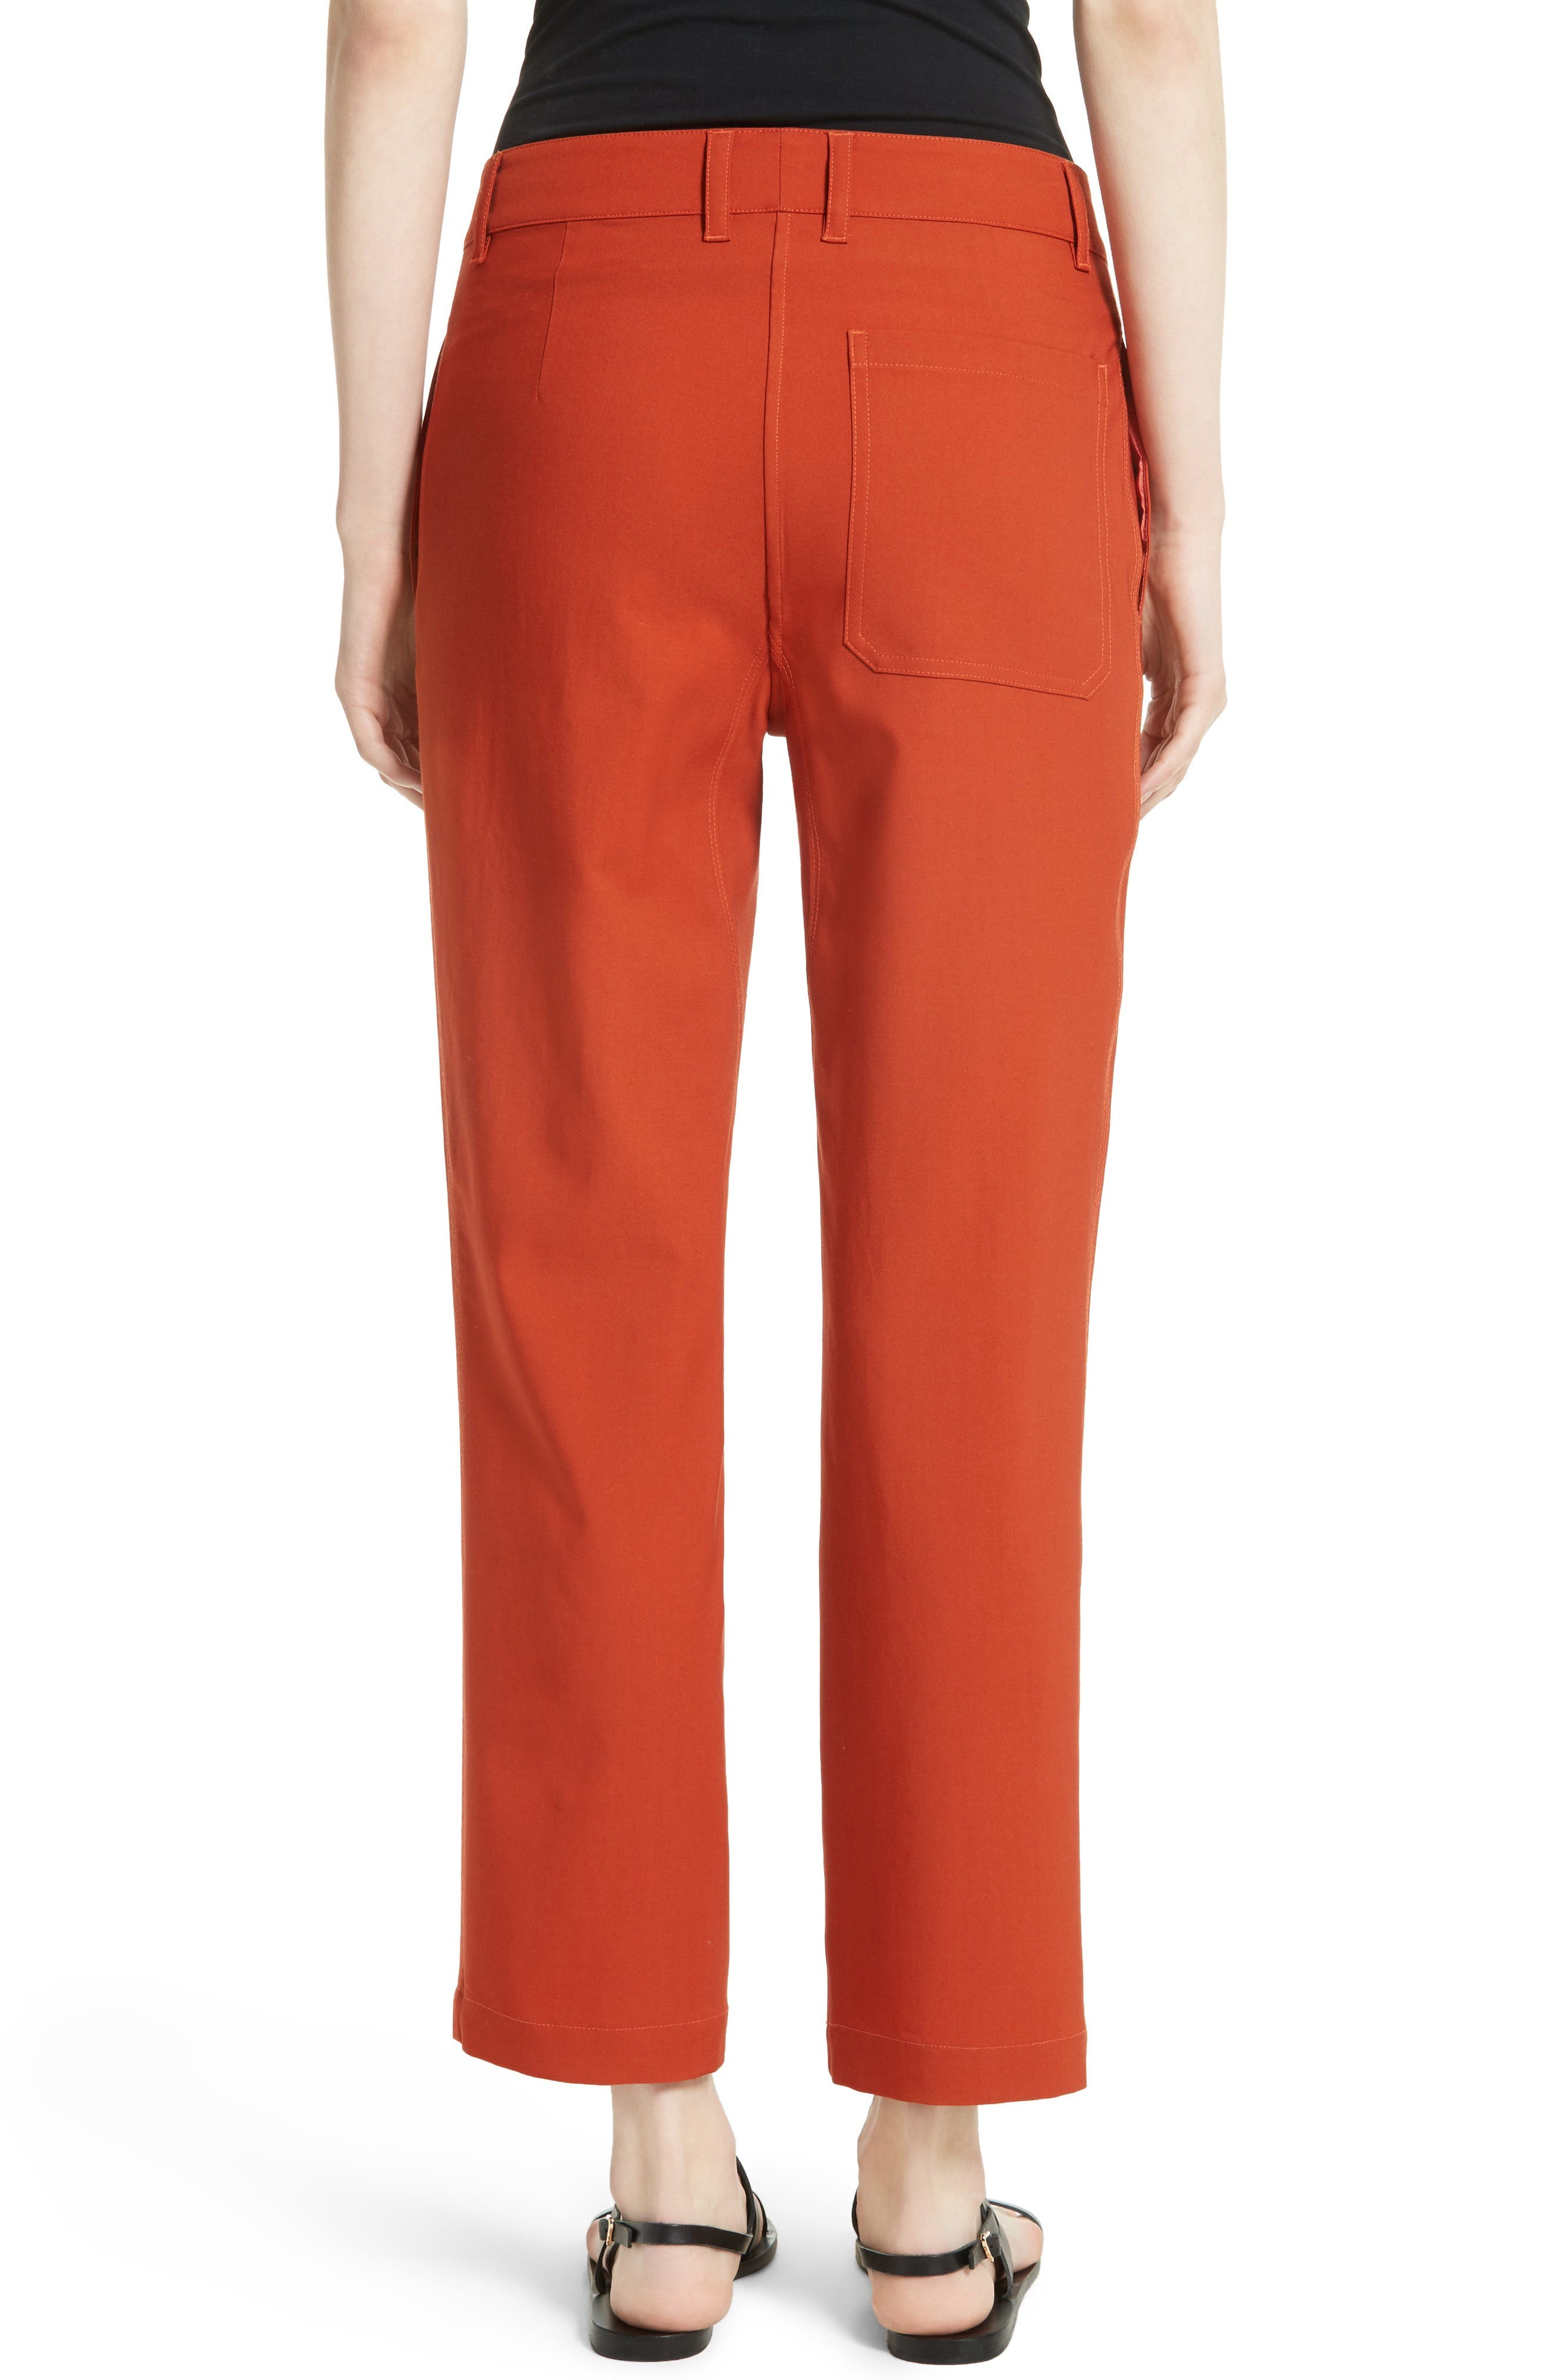 Thorelle B New Stretch Wool Pants,                             Alternate thumbnail 2, color,                             837